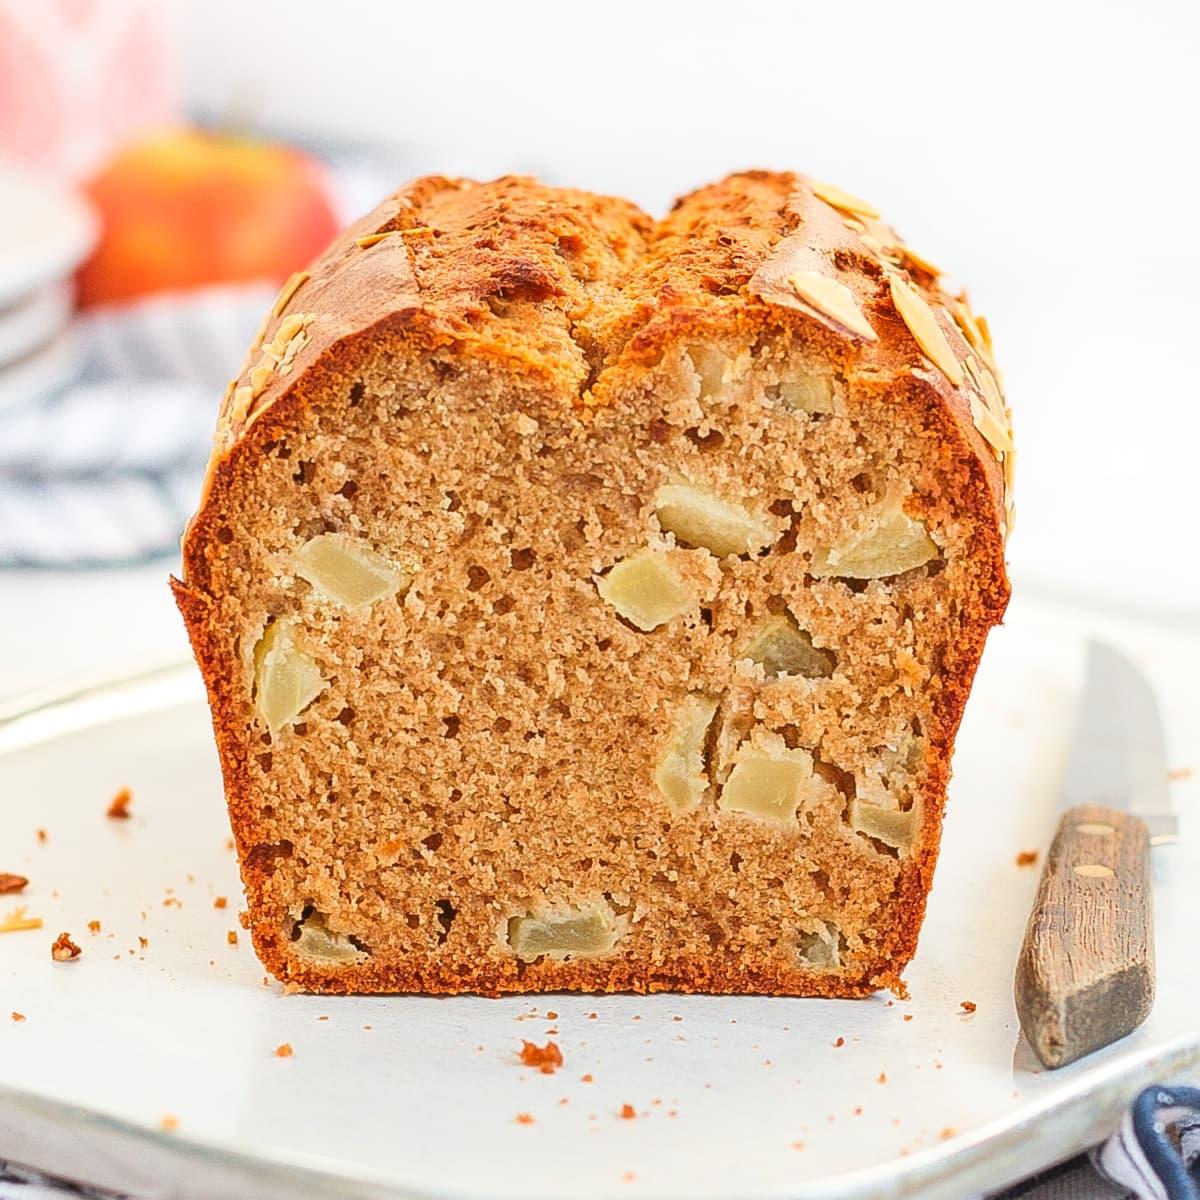 Crumb Shot of the loaf sliced in half.